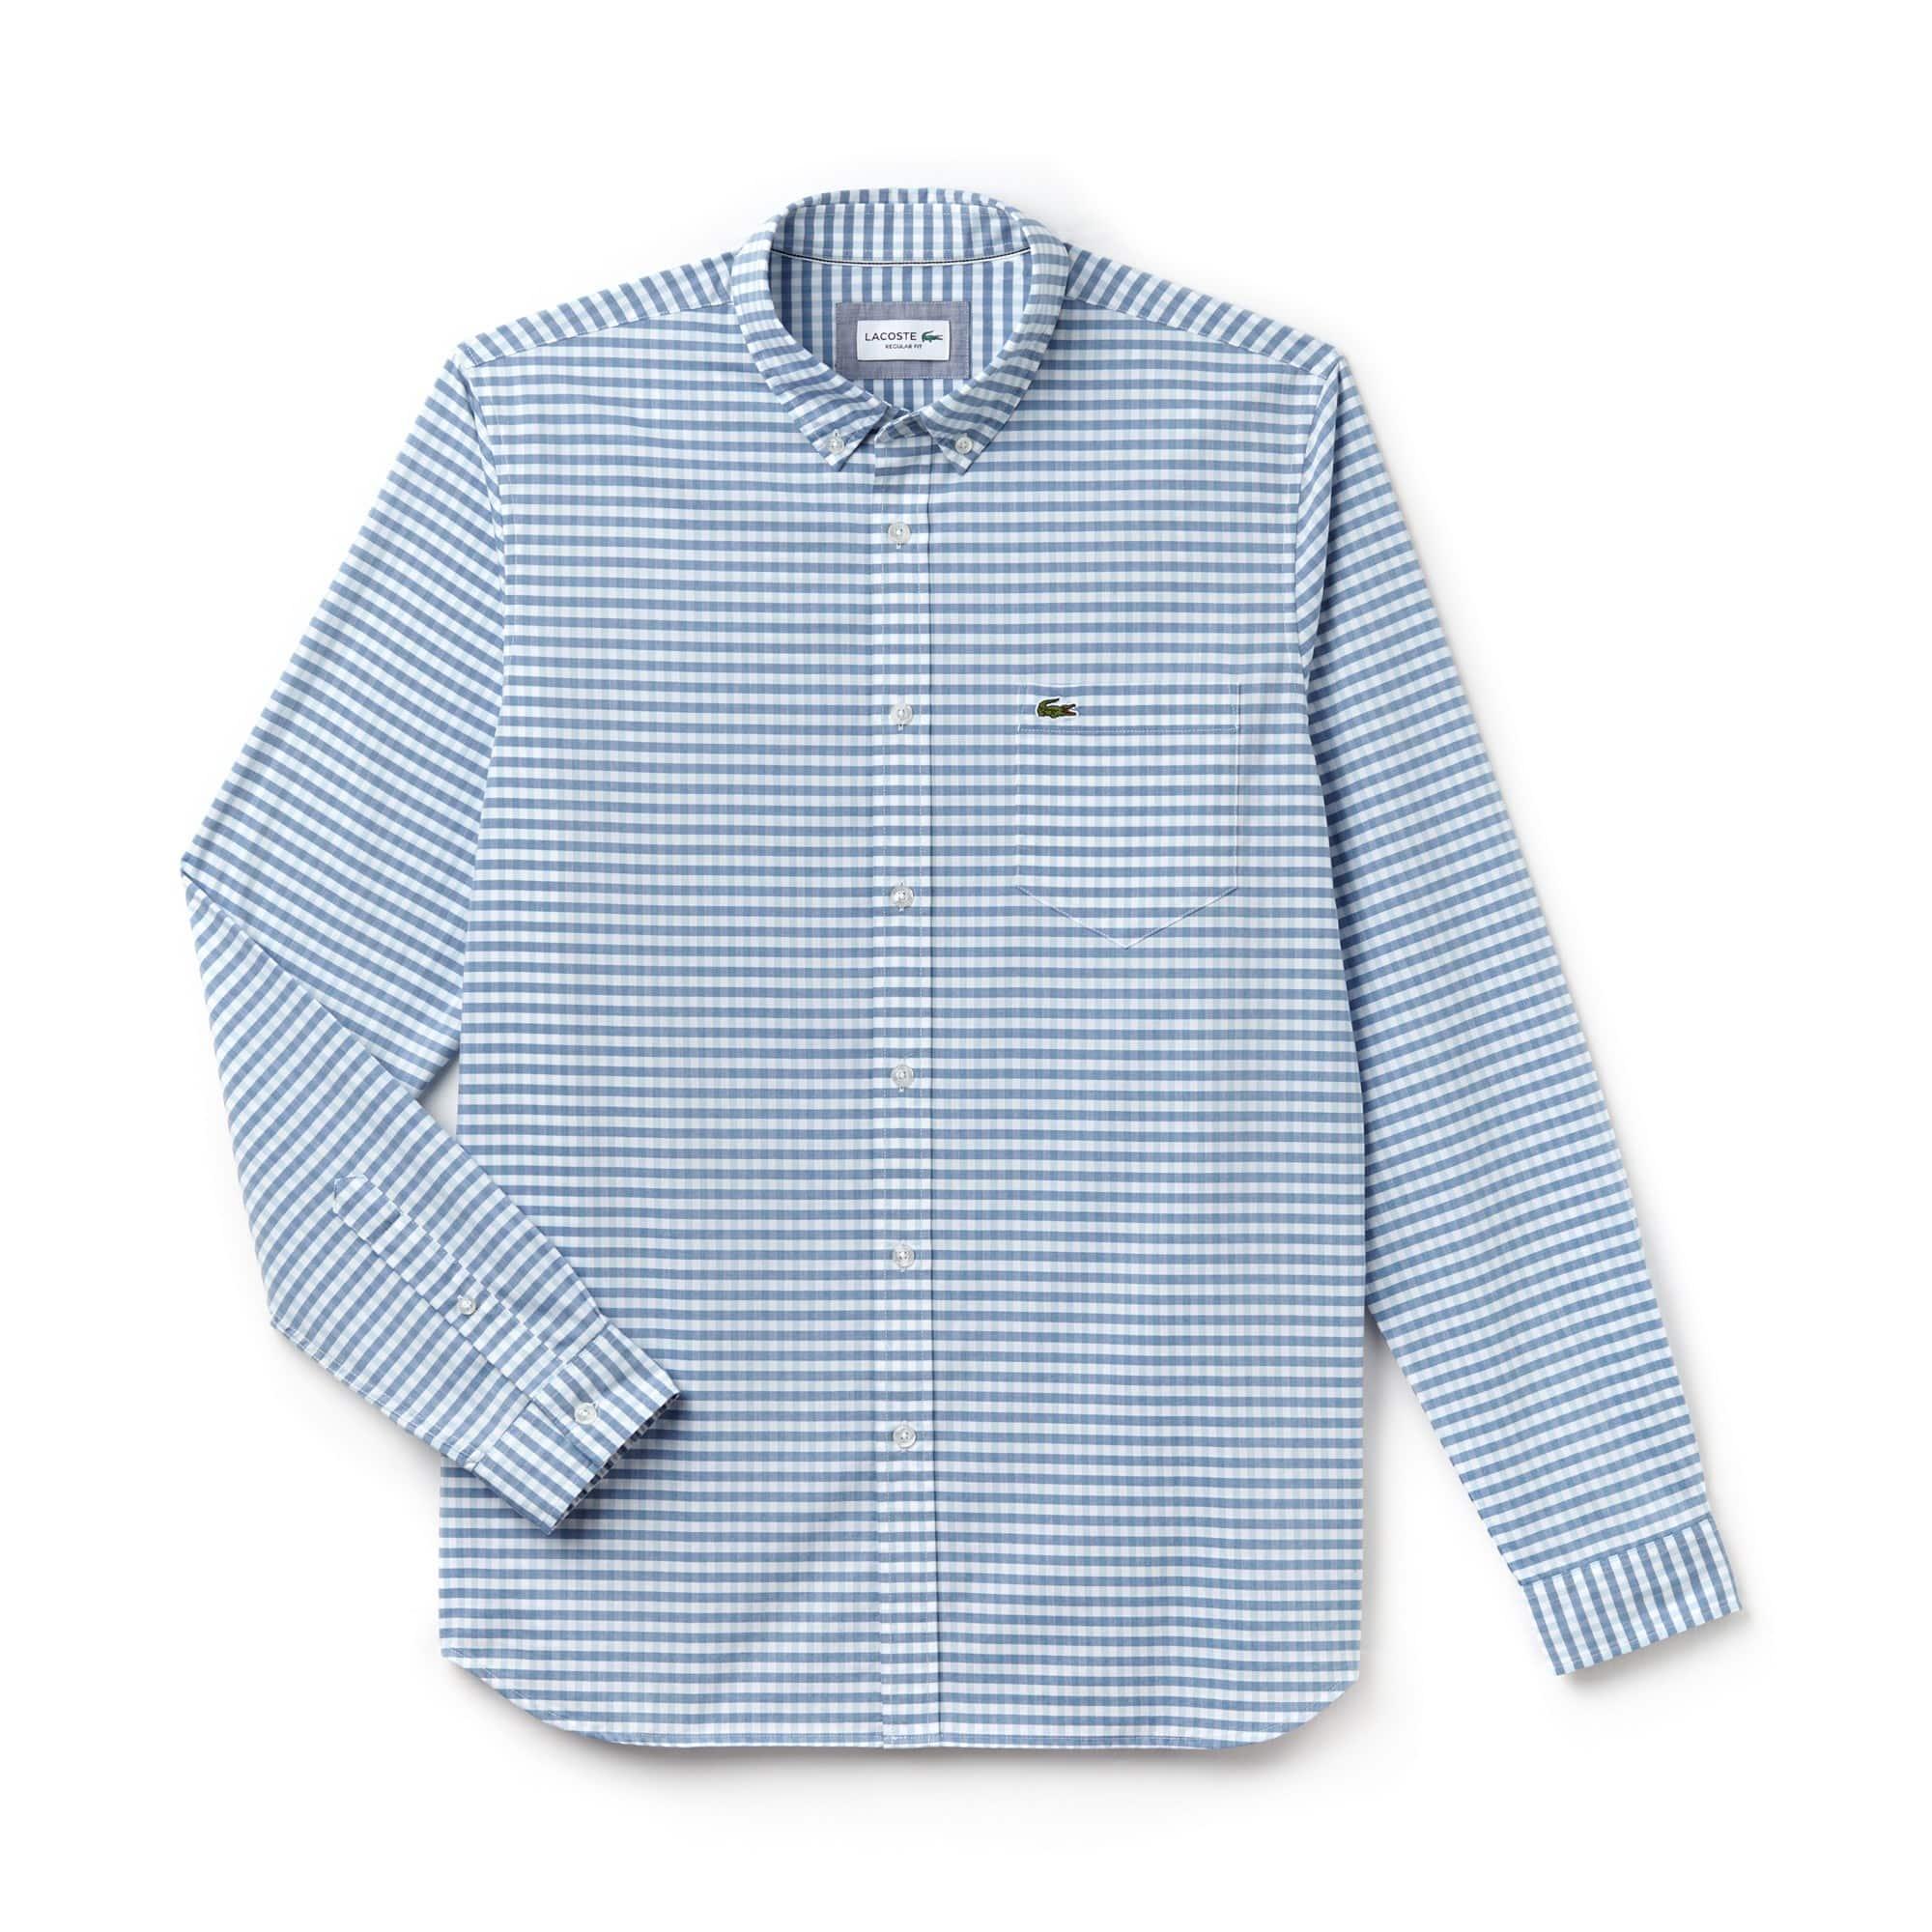 Camisa Regular Fit Masculina em Popeline de Algodão Minixadrez